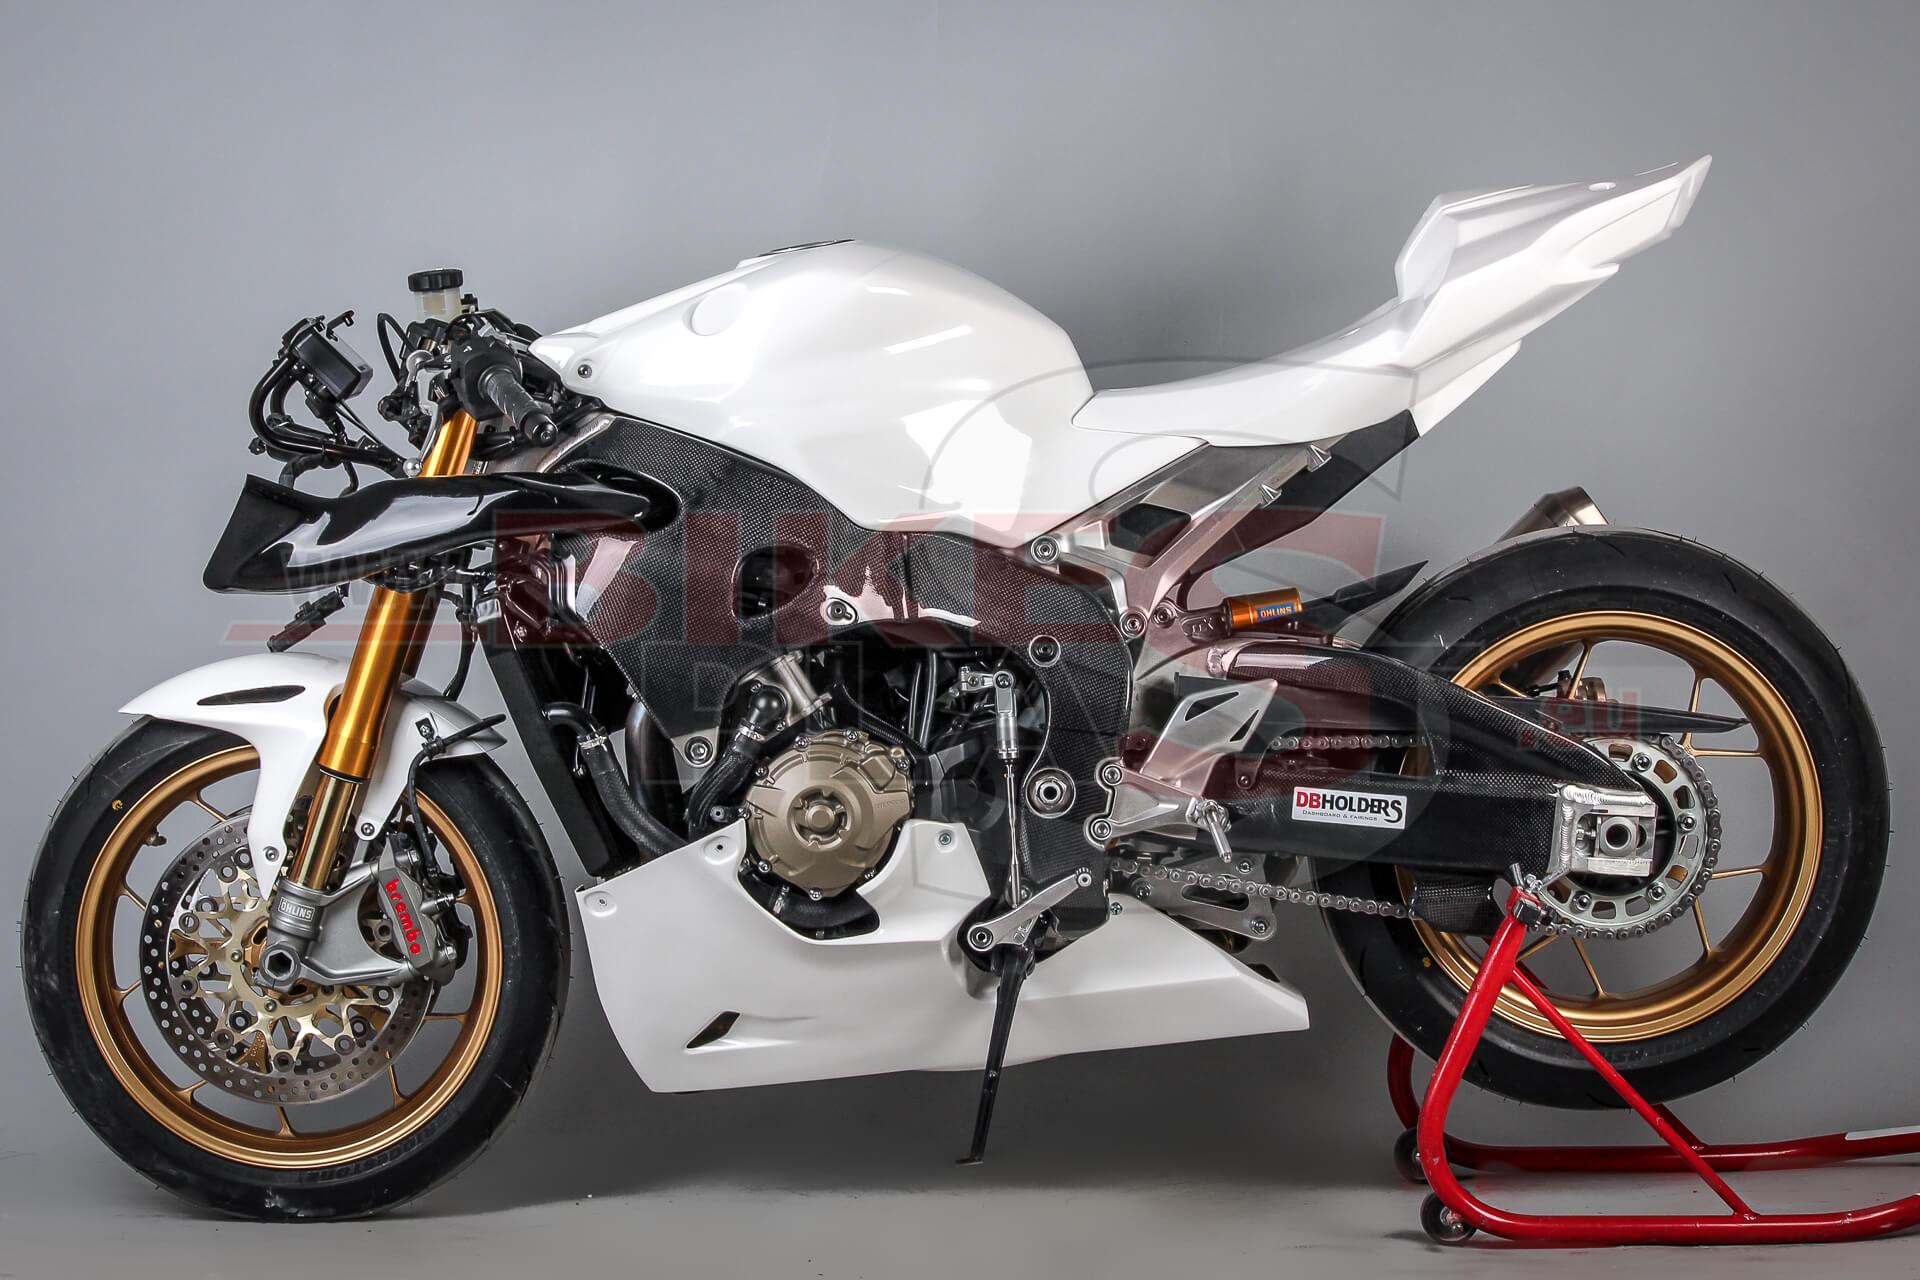 Kit Honda Cbr 1000rr 2017 2018 Bikesplast Com